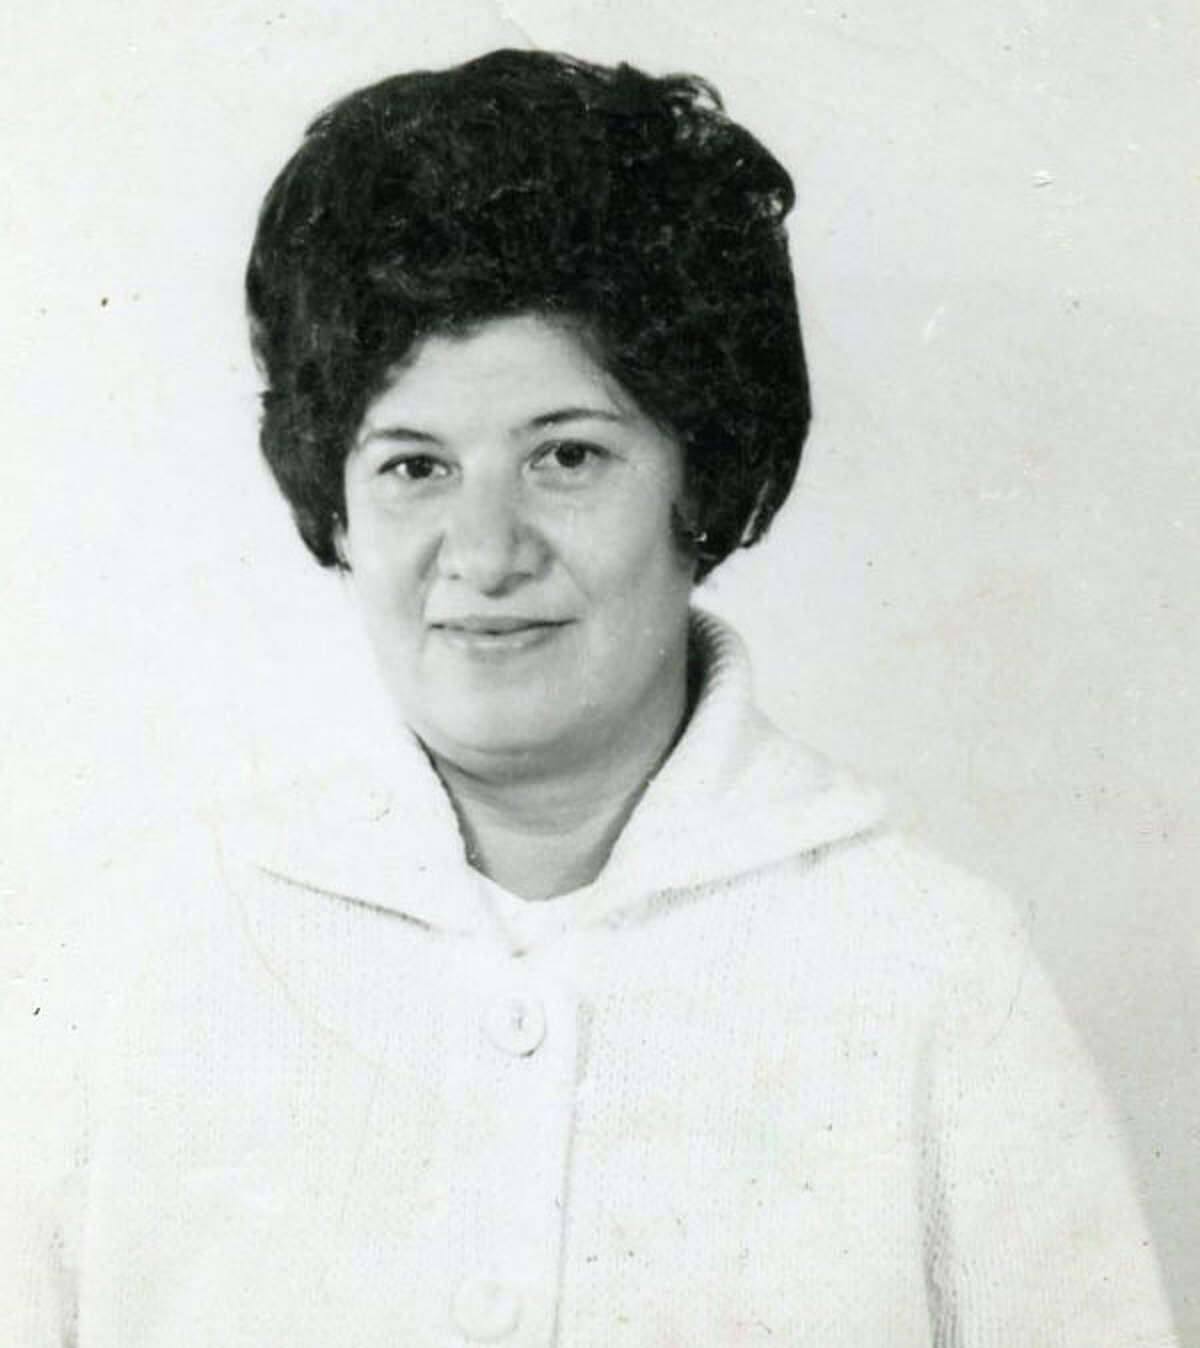 Maria Luisa Lara